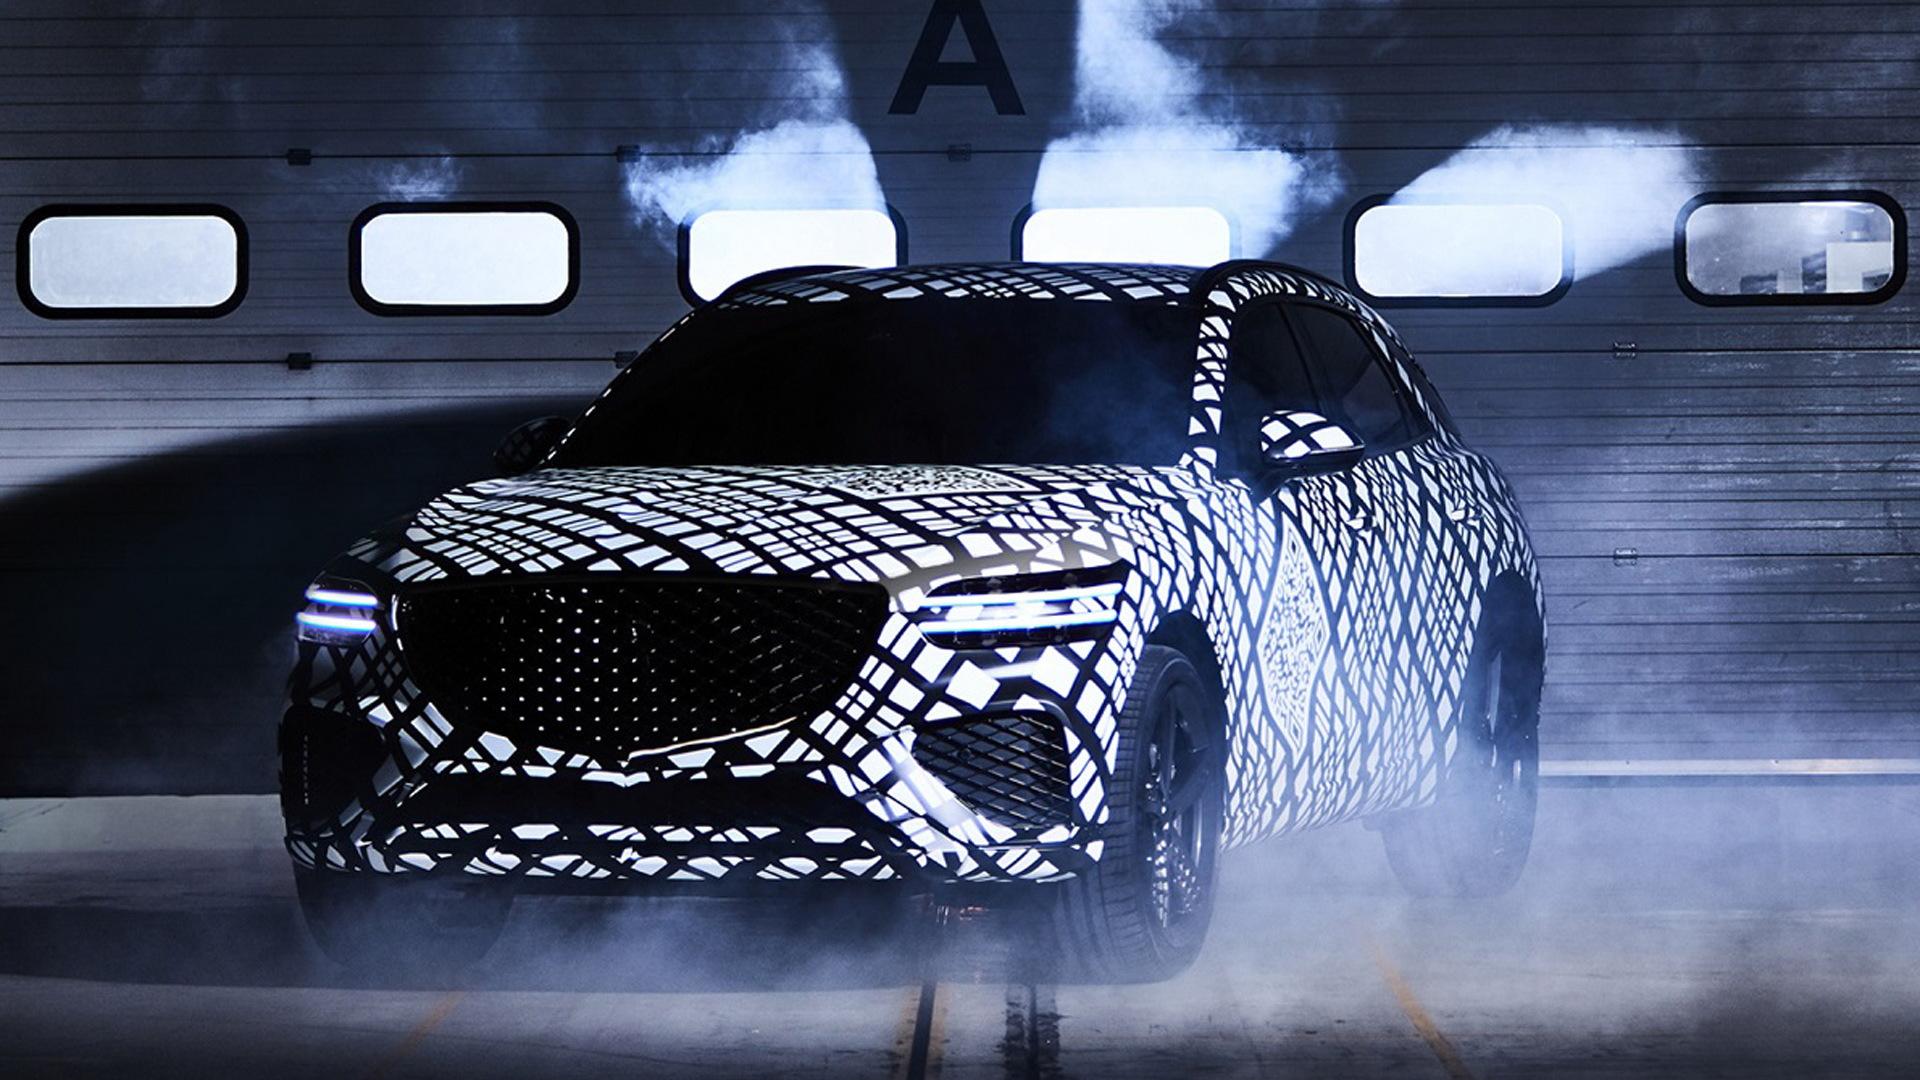 Teaser for Genesis GV70 debuting in 2021